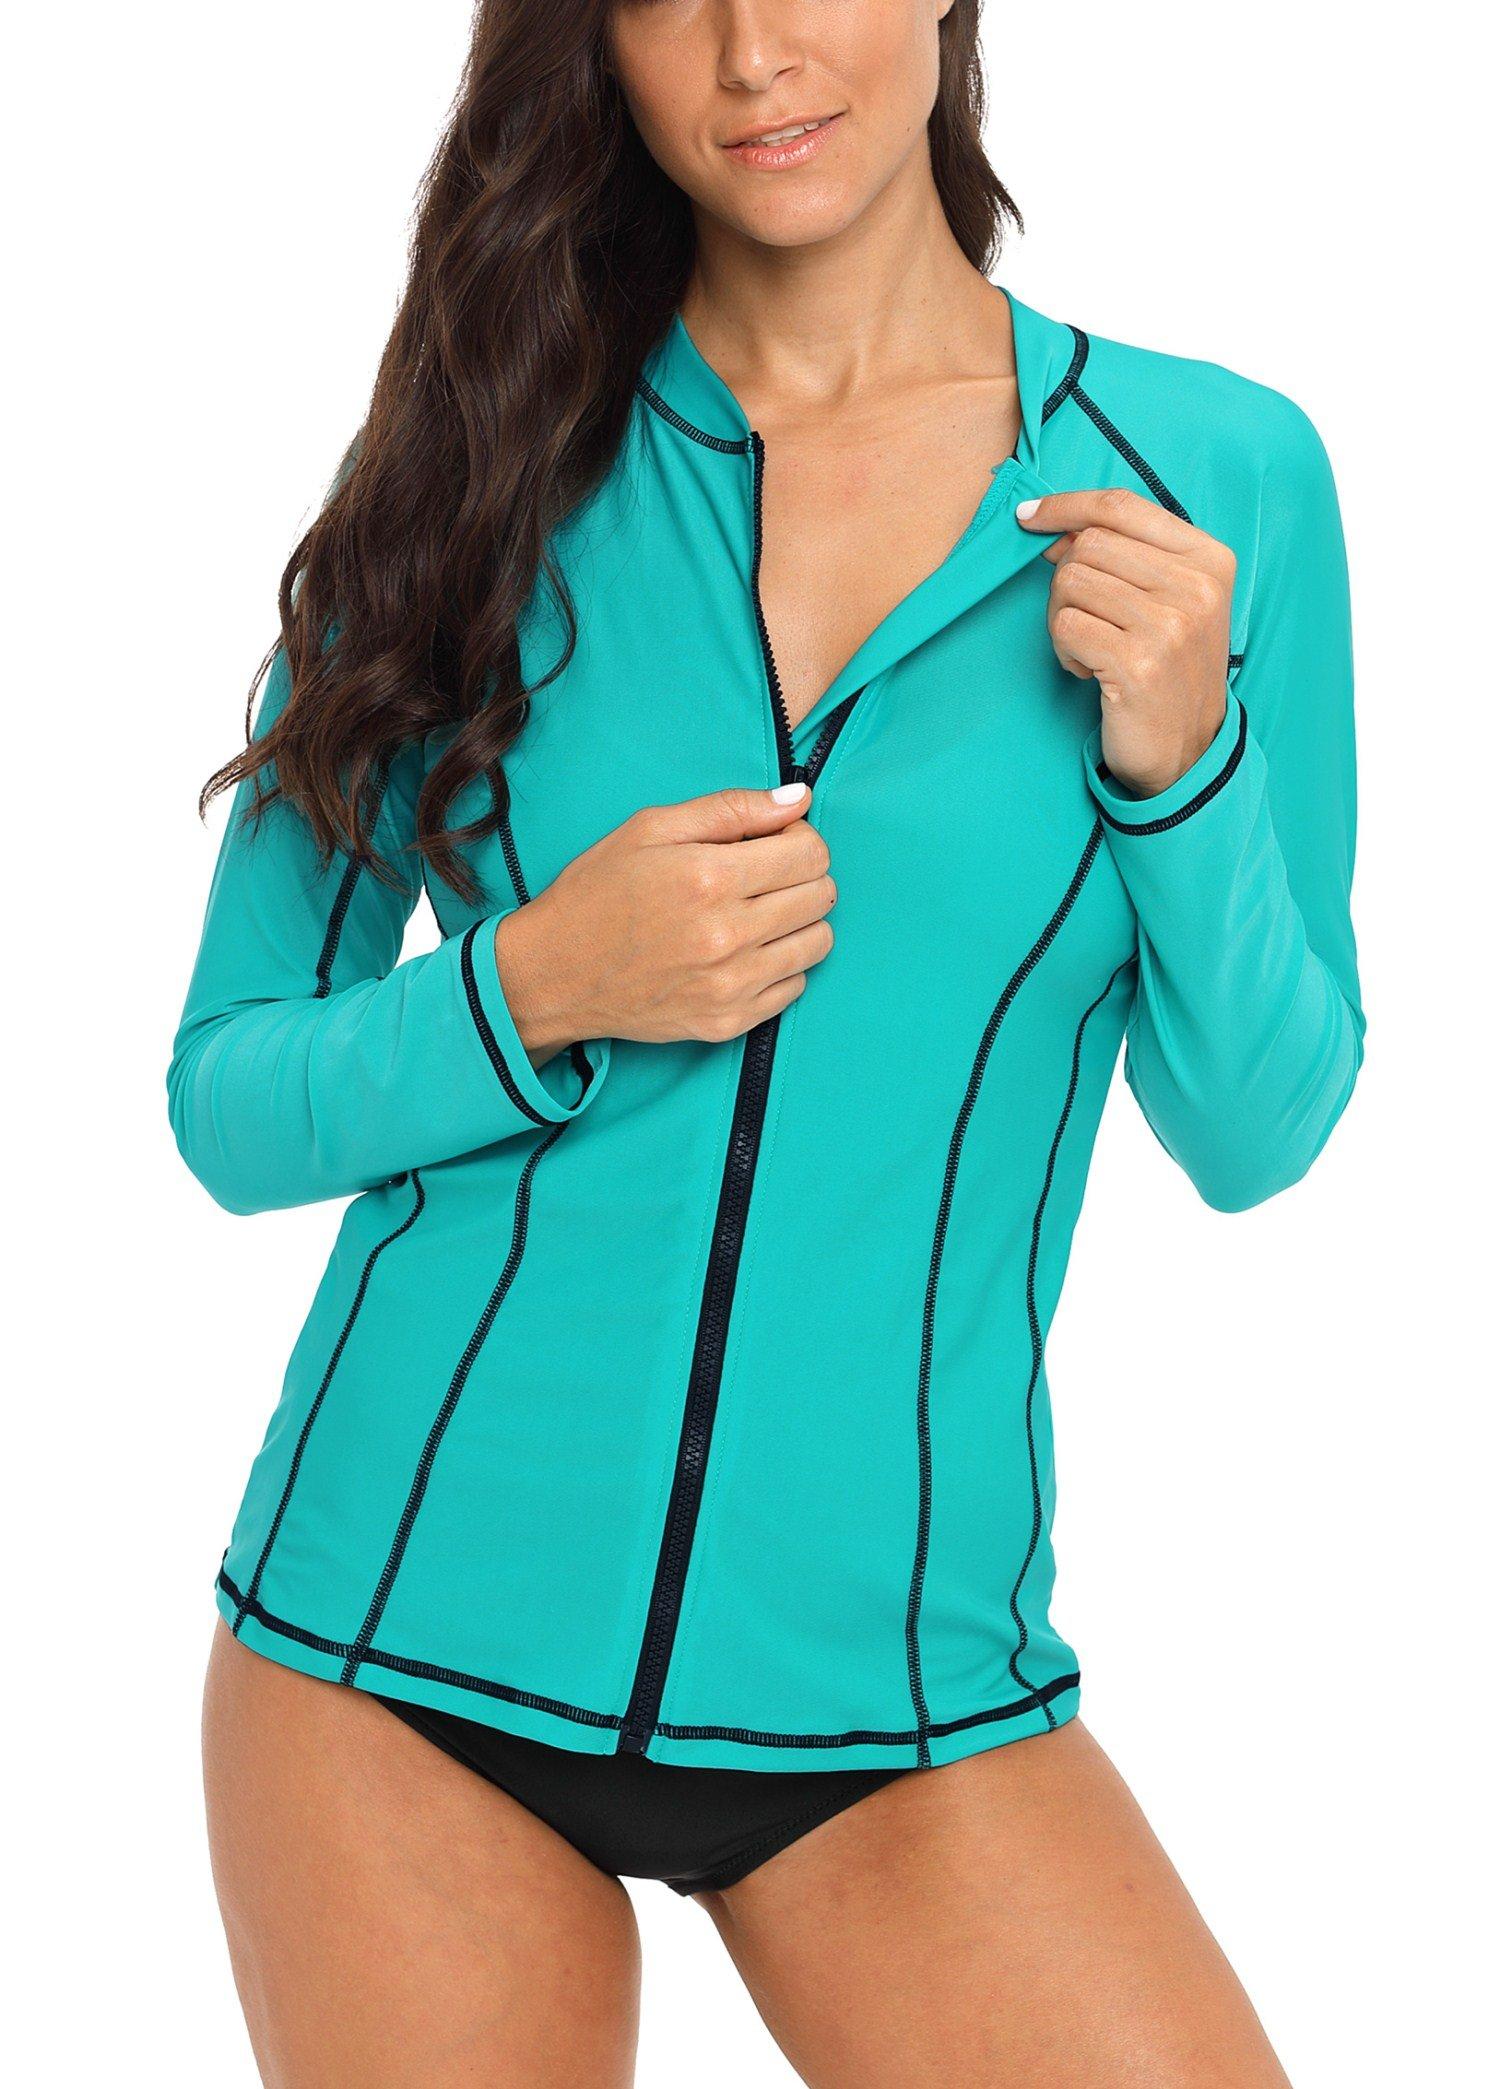 Charmleaks woman long sleeve upf 50+ zipper athletic rash guard top aqua xx-large